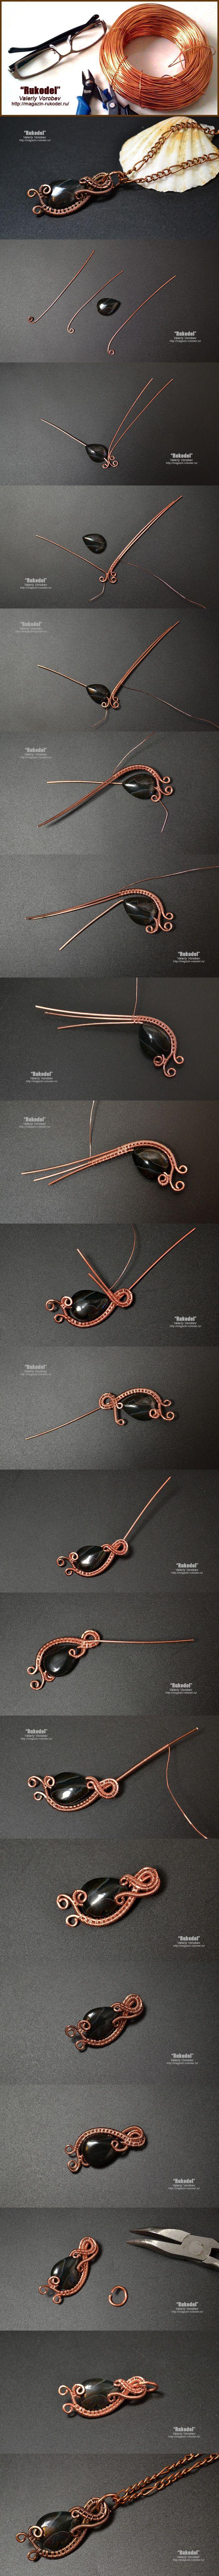 Wire Wrapping для начинающих.   Jewelry Making   Pinterest   Wire ...